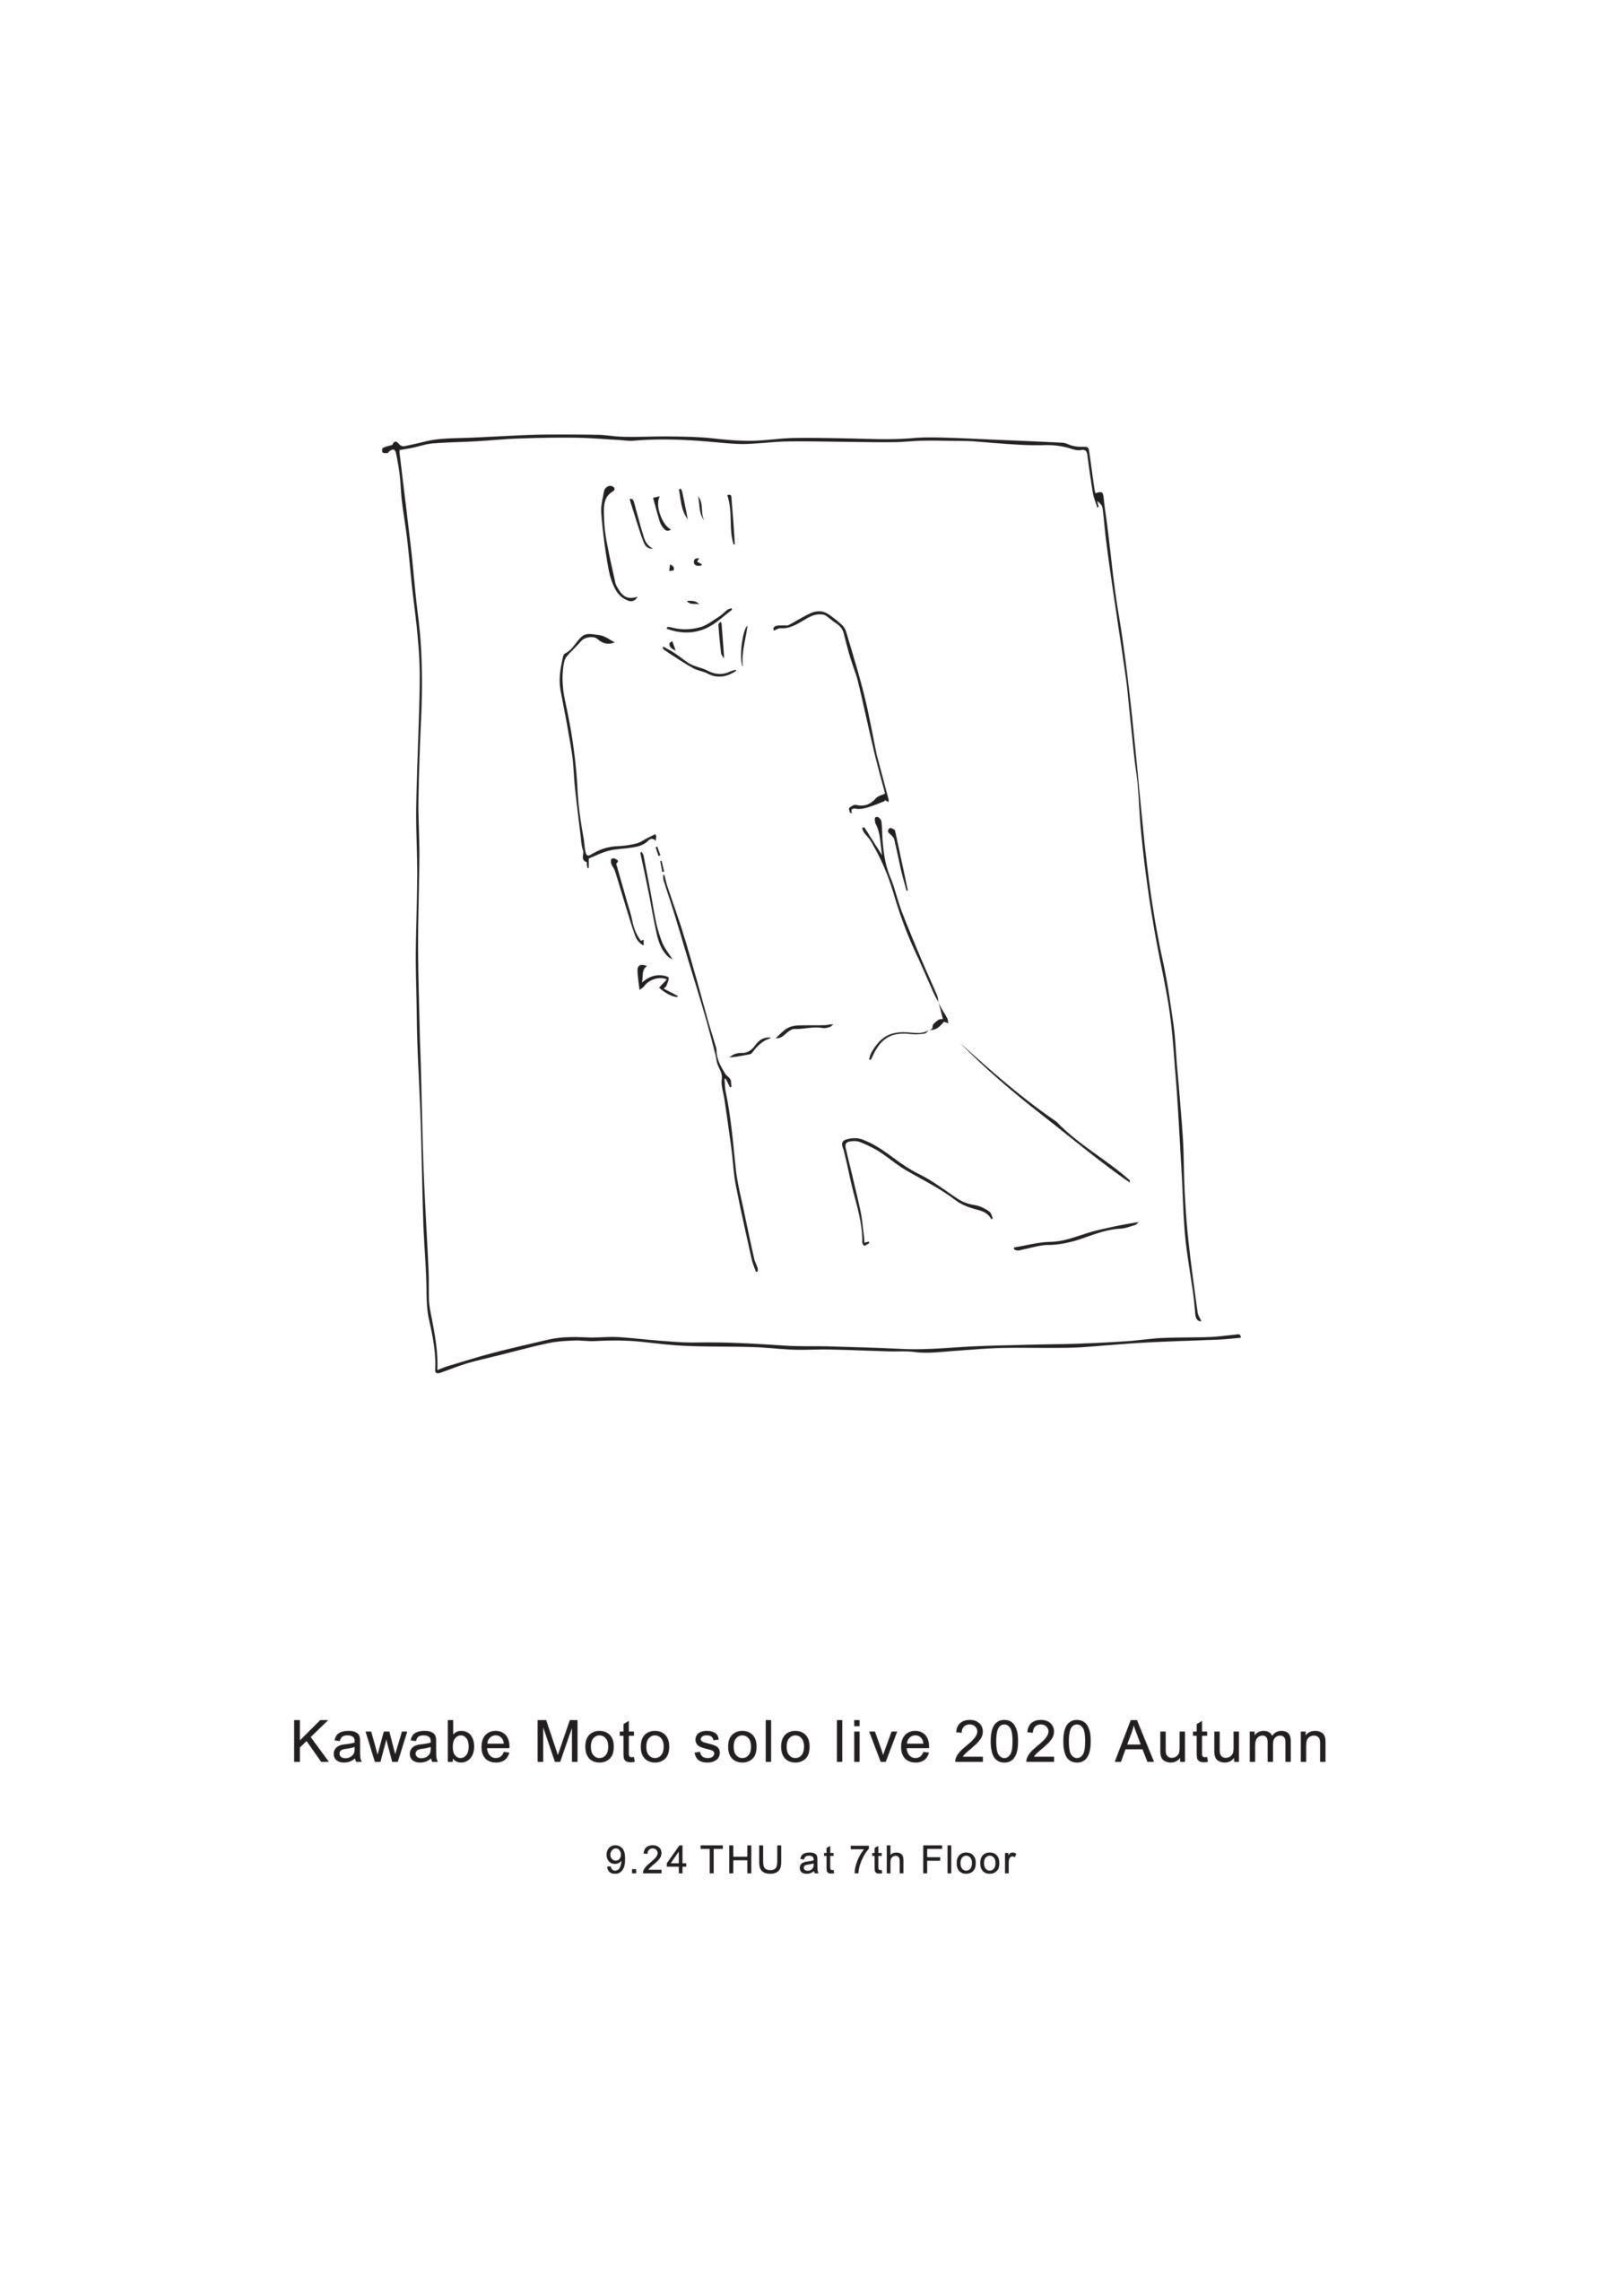 Kawabe Moto solo live 2020 Autumn